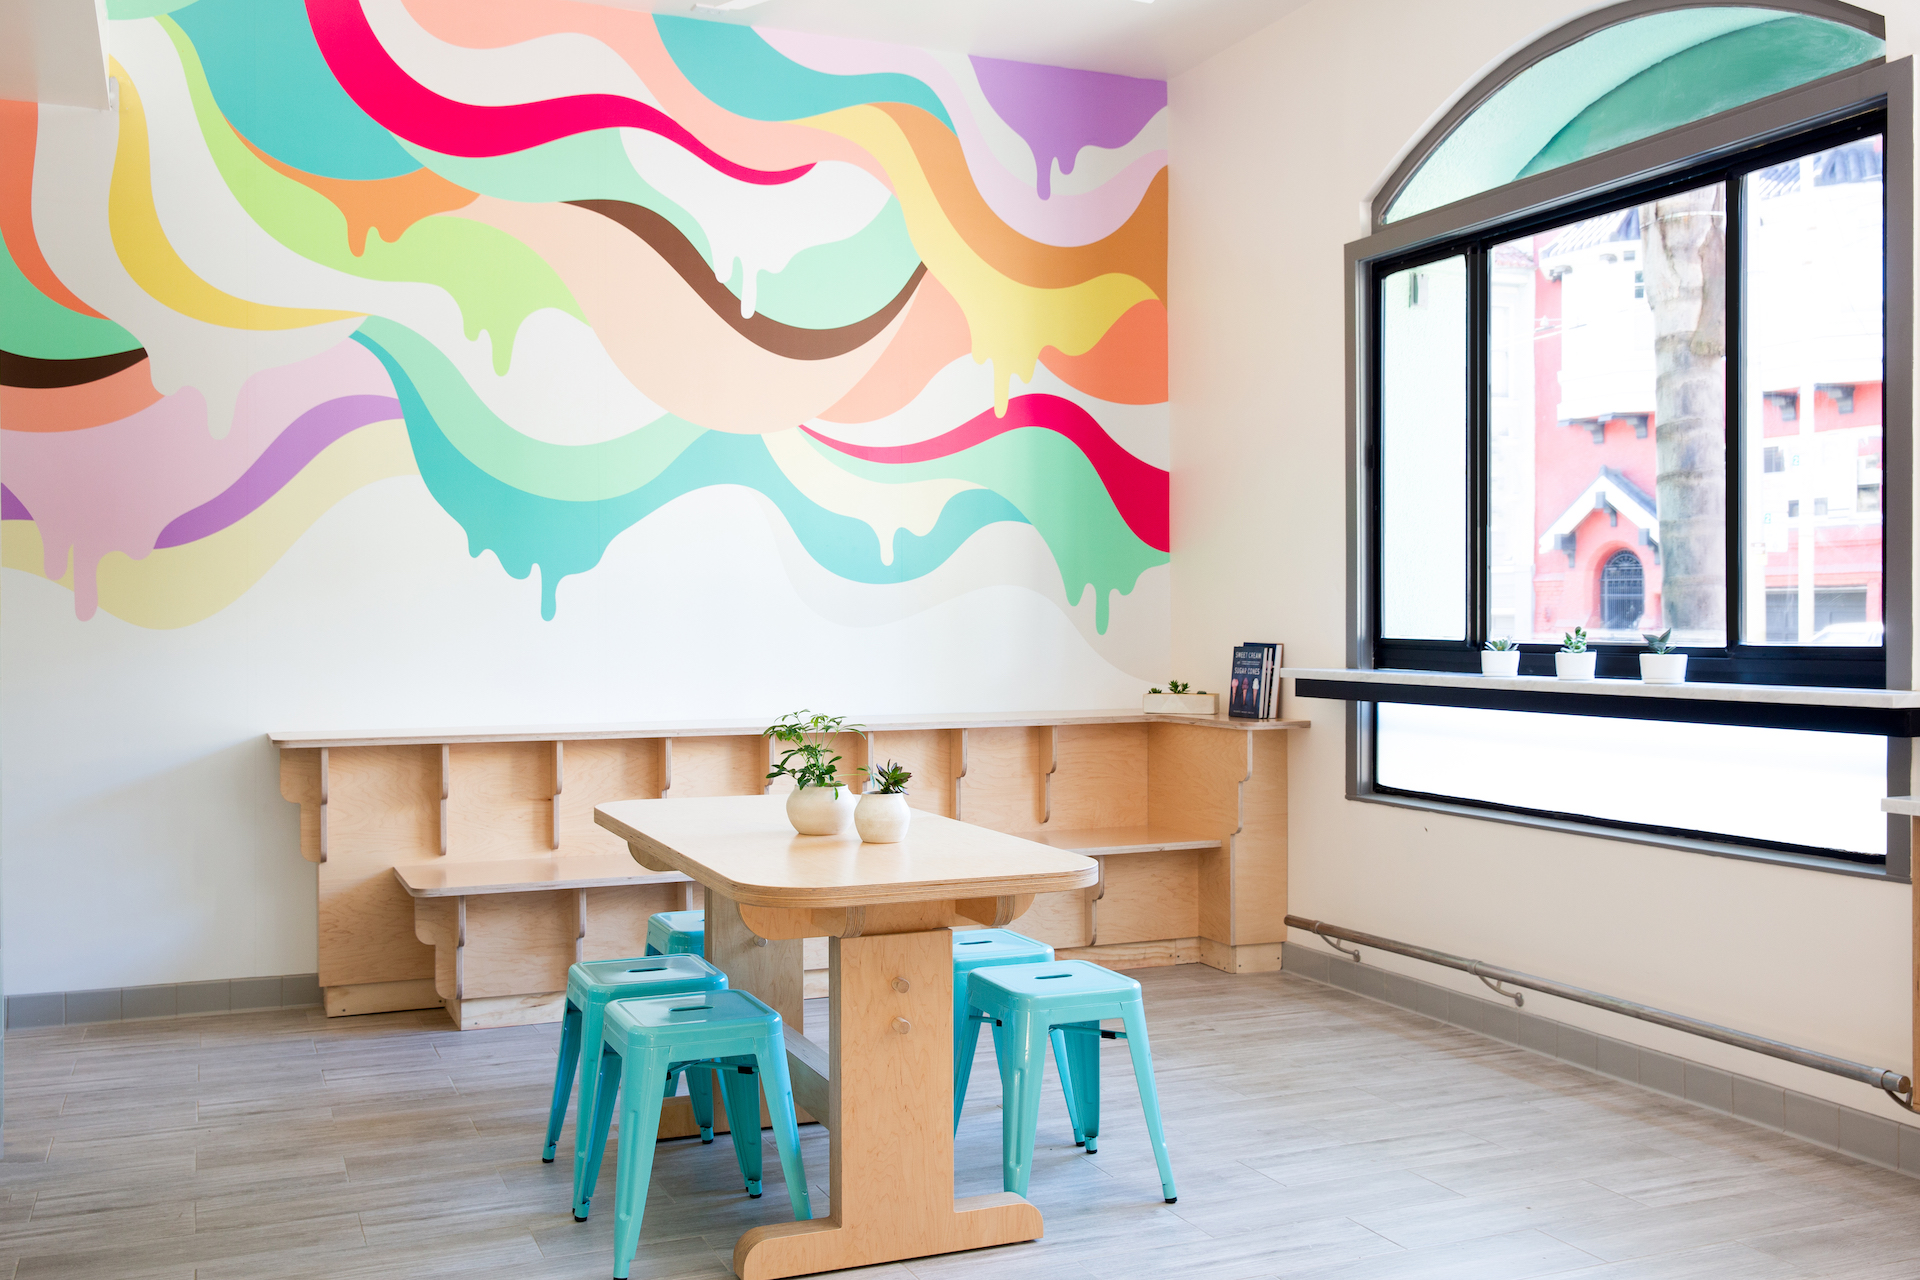 Bi-Rite Creamery's vibrant new ice cream-inspired mural